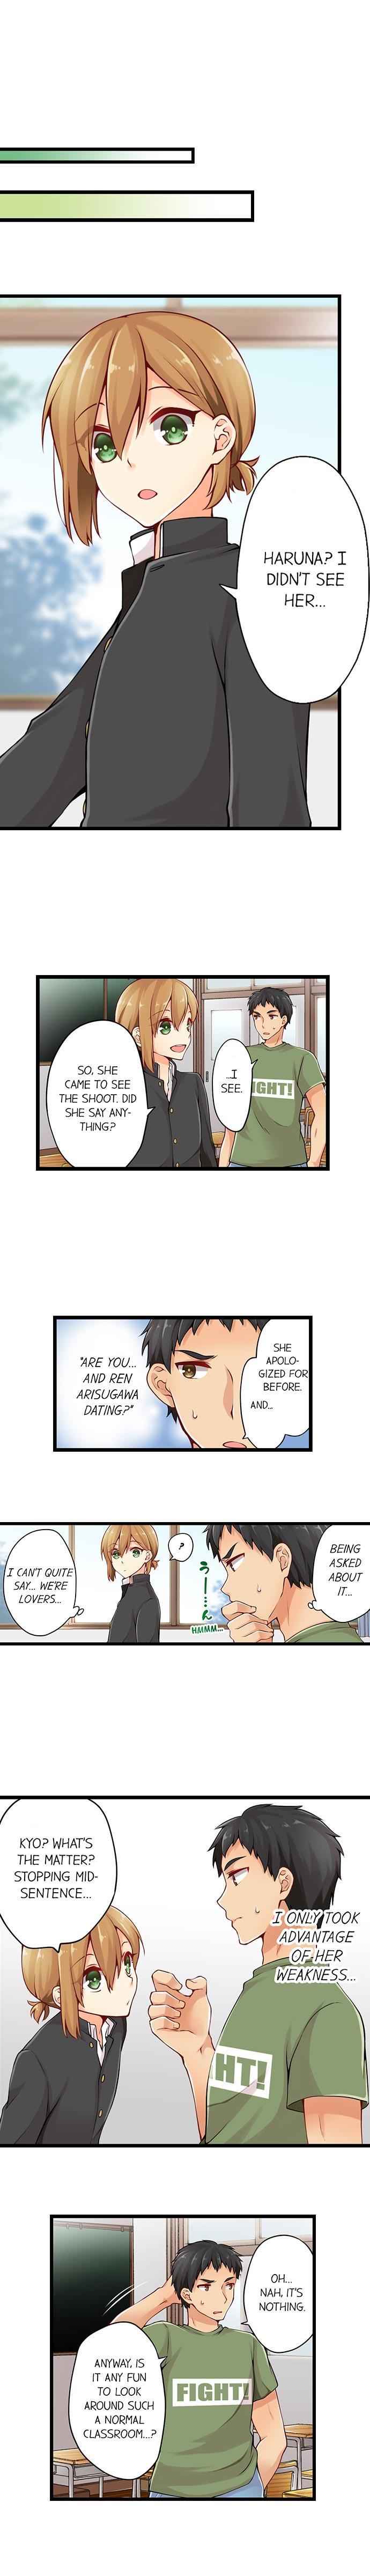 Ren Arisugawa Is Actually A Girl 170